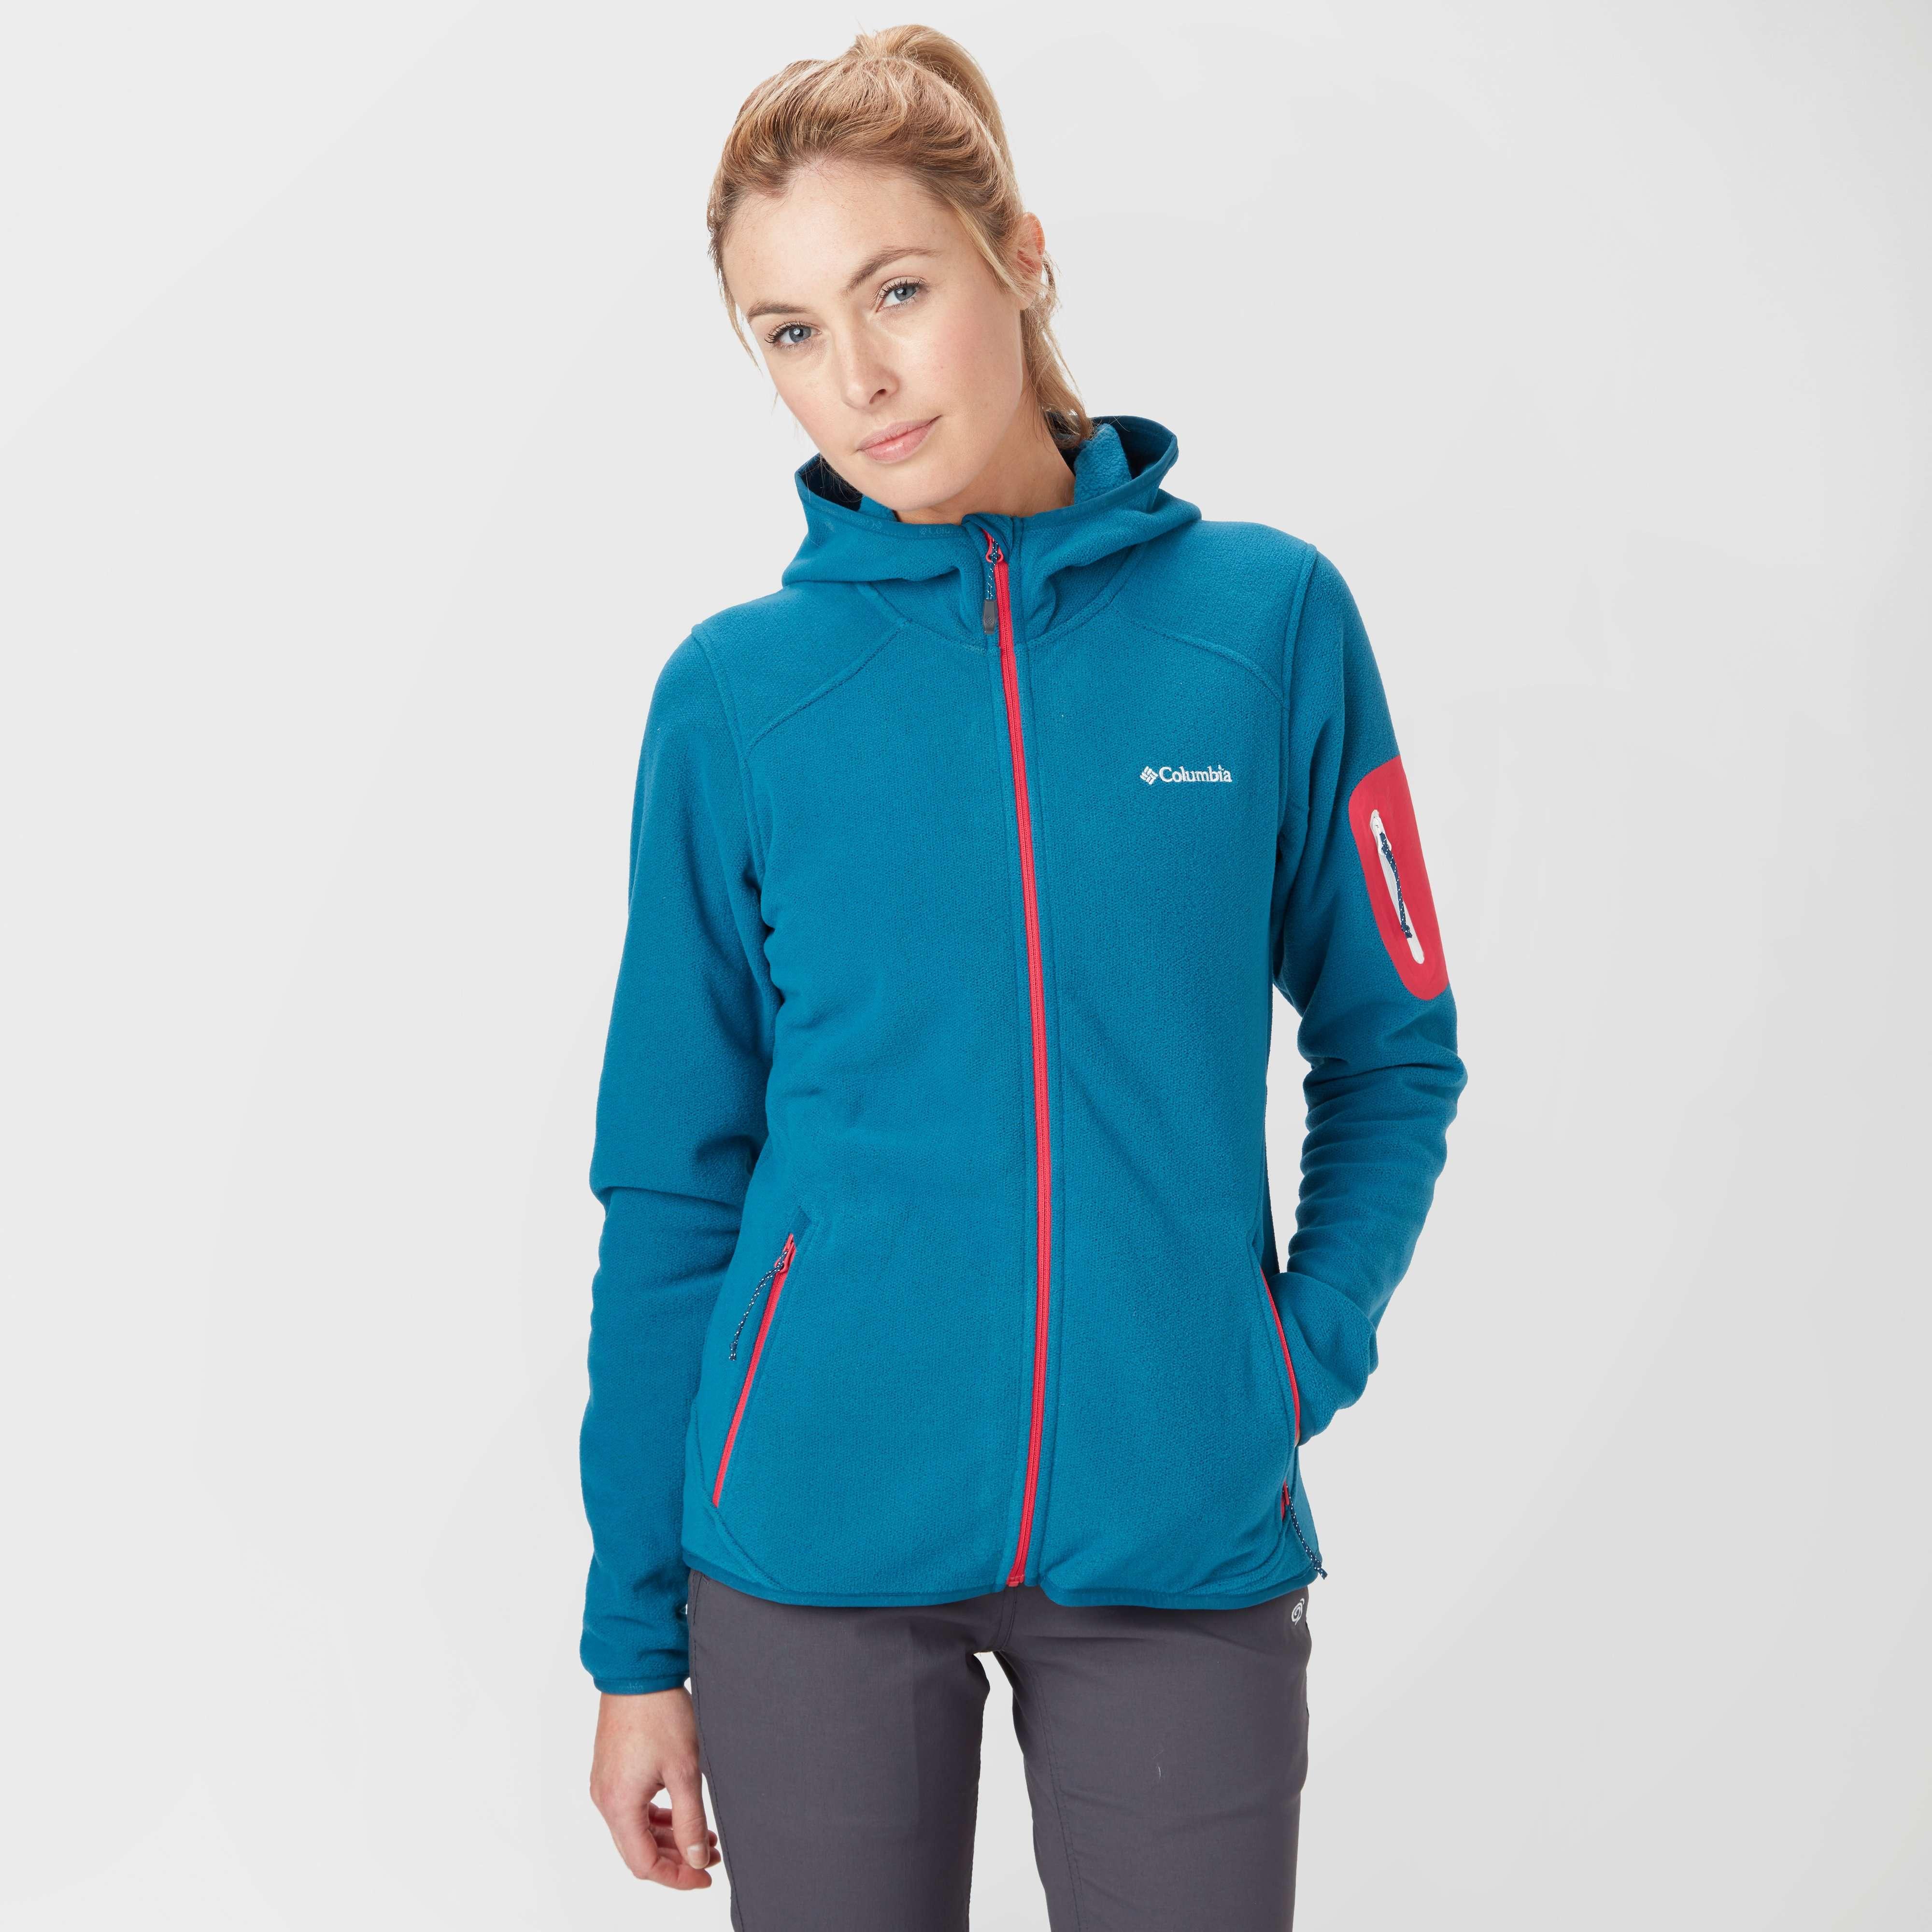 COLUMBIA Women's Outdoor Novelty Hooded Jacket